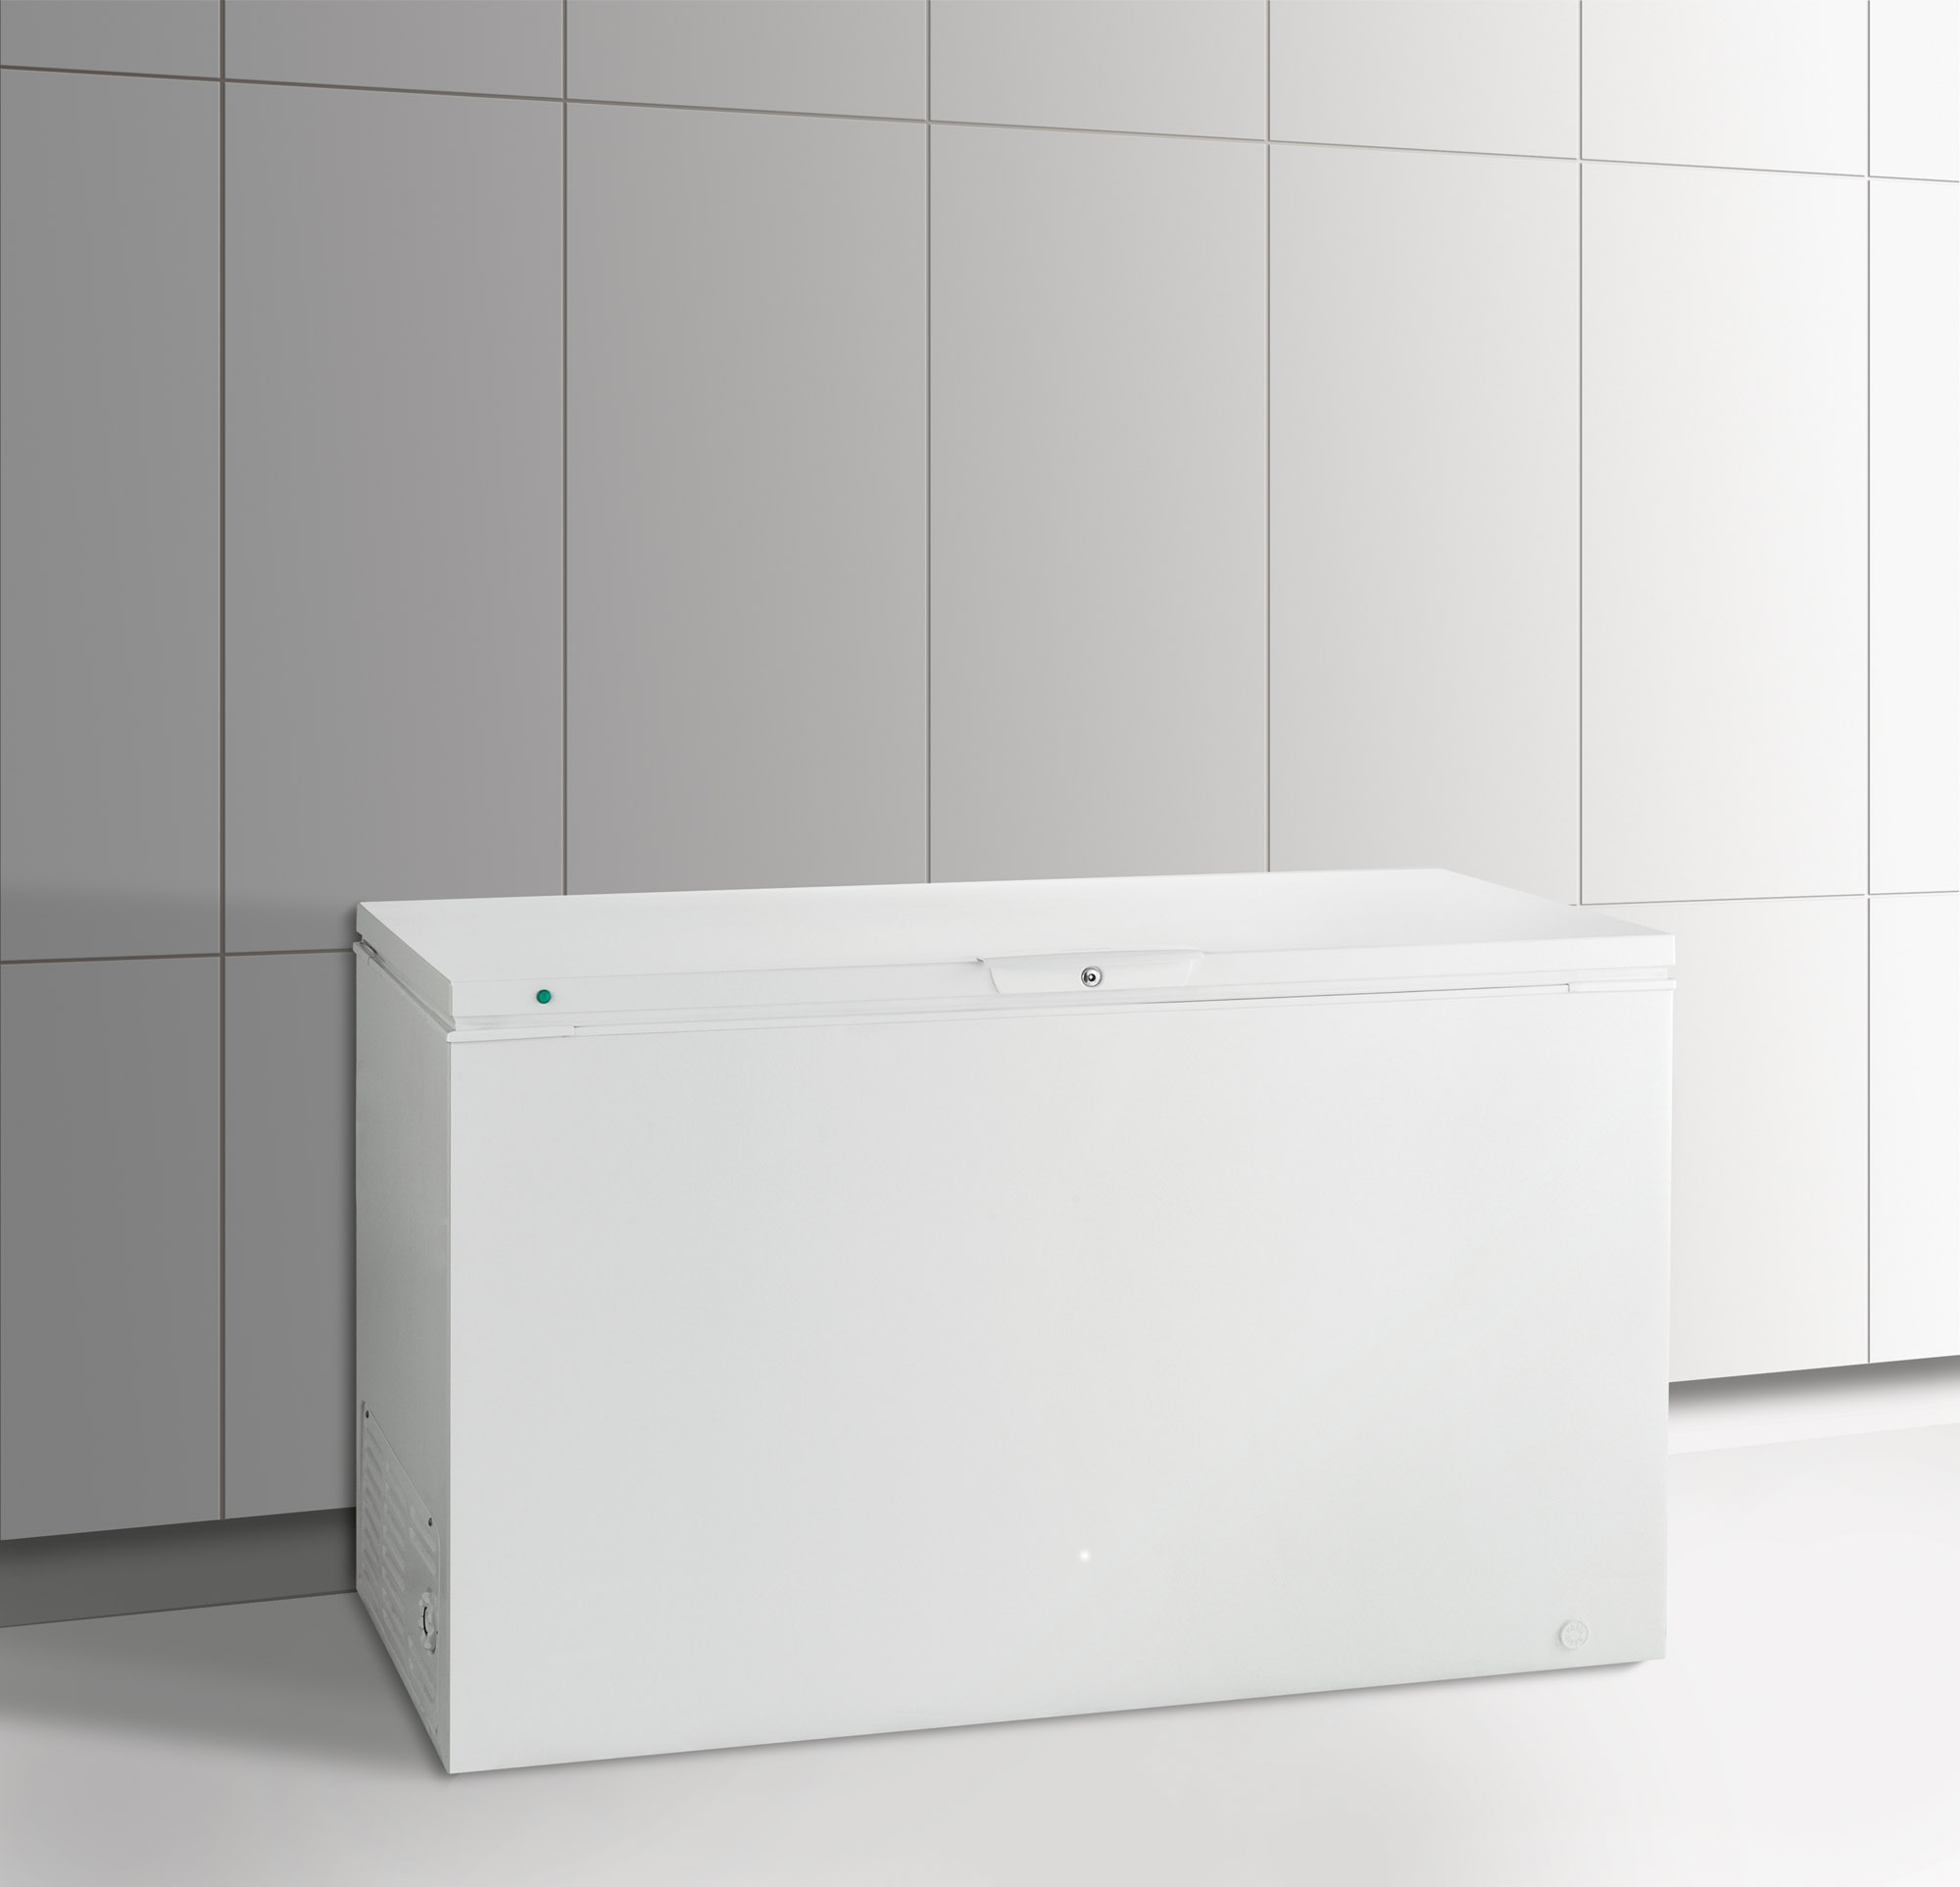 Frigidaire FFFC16M5QW 15.6 cu. ft. Chest Freezer - White